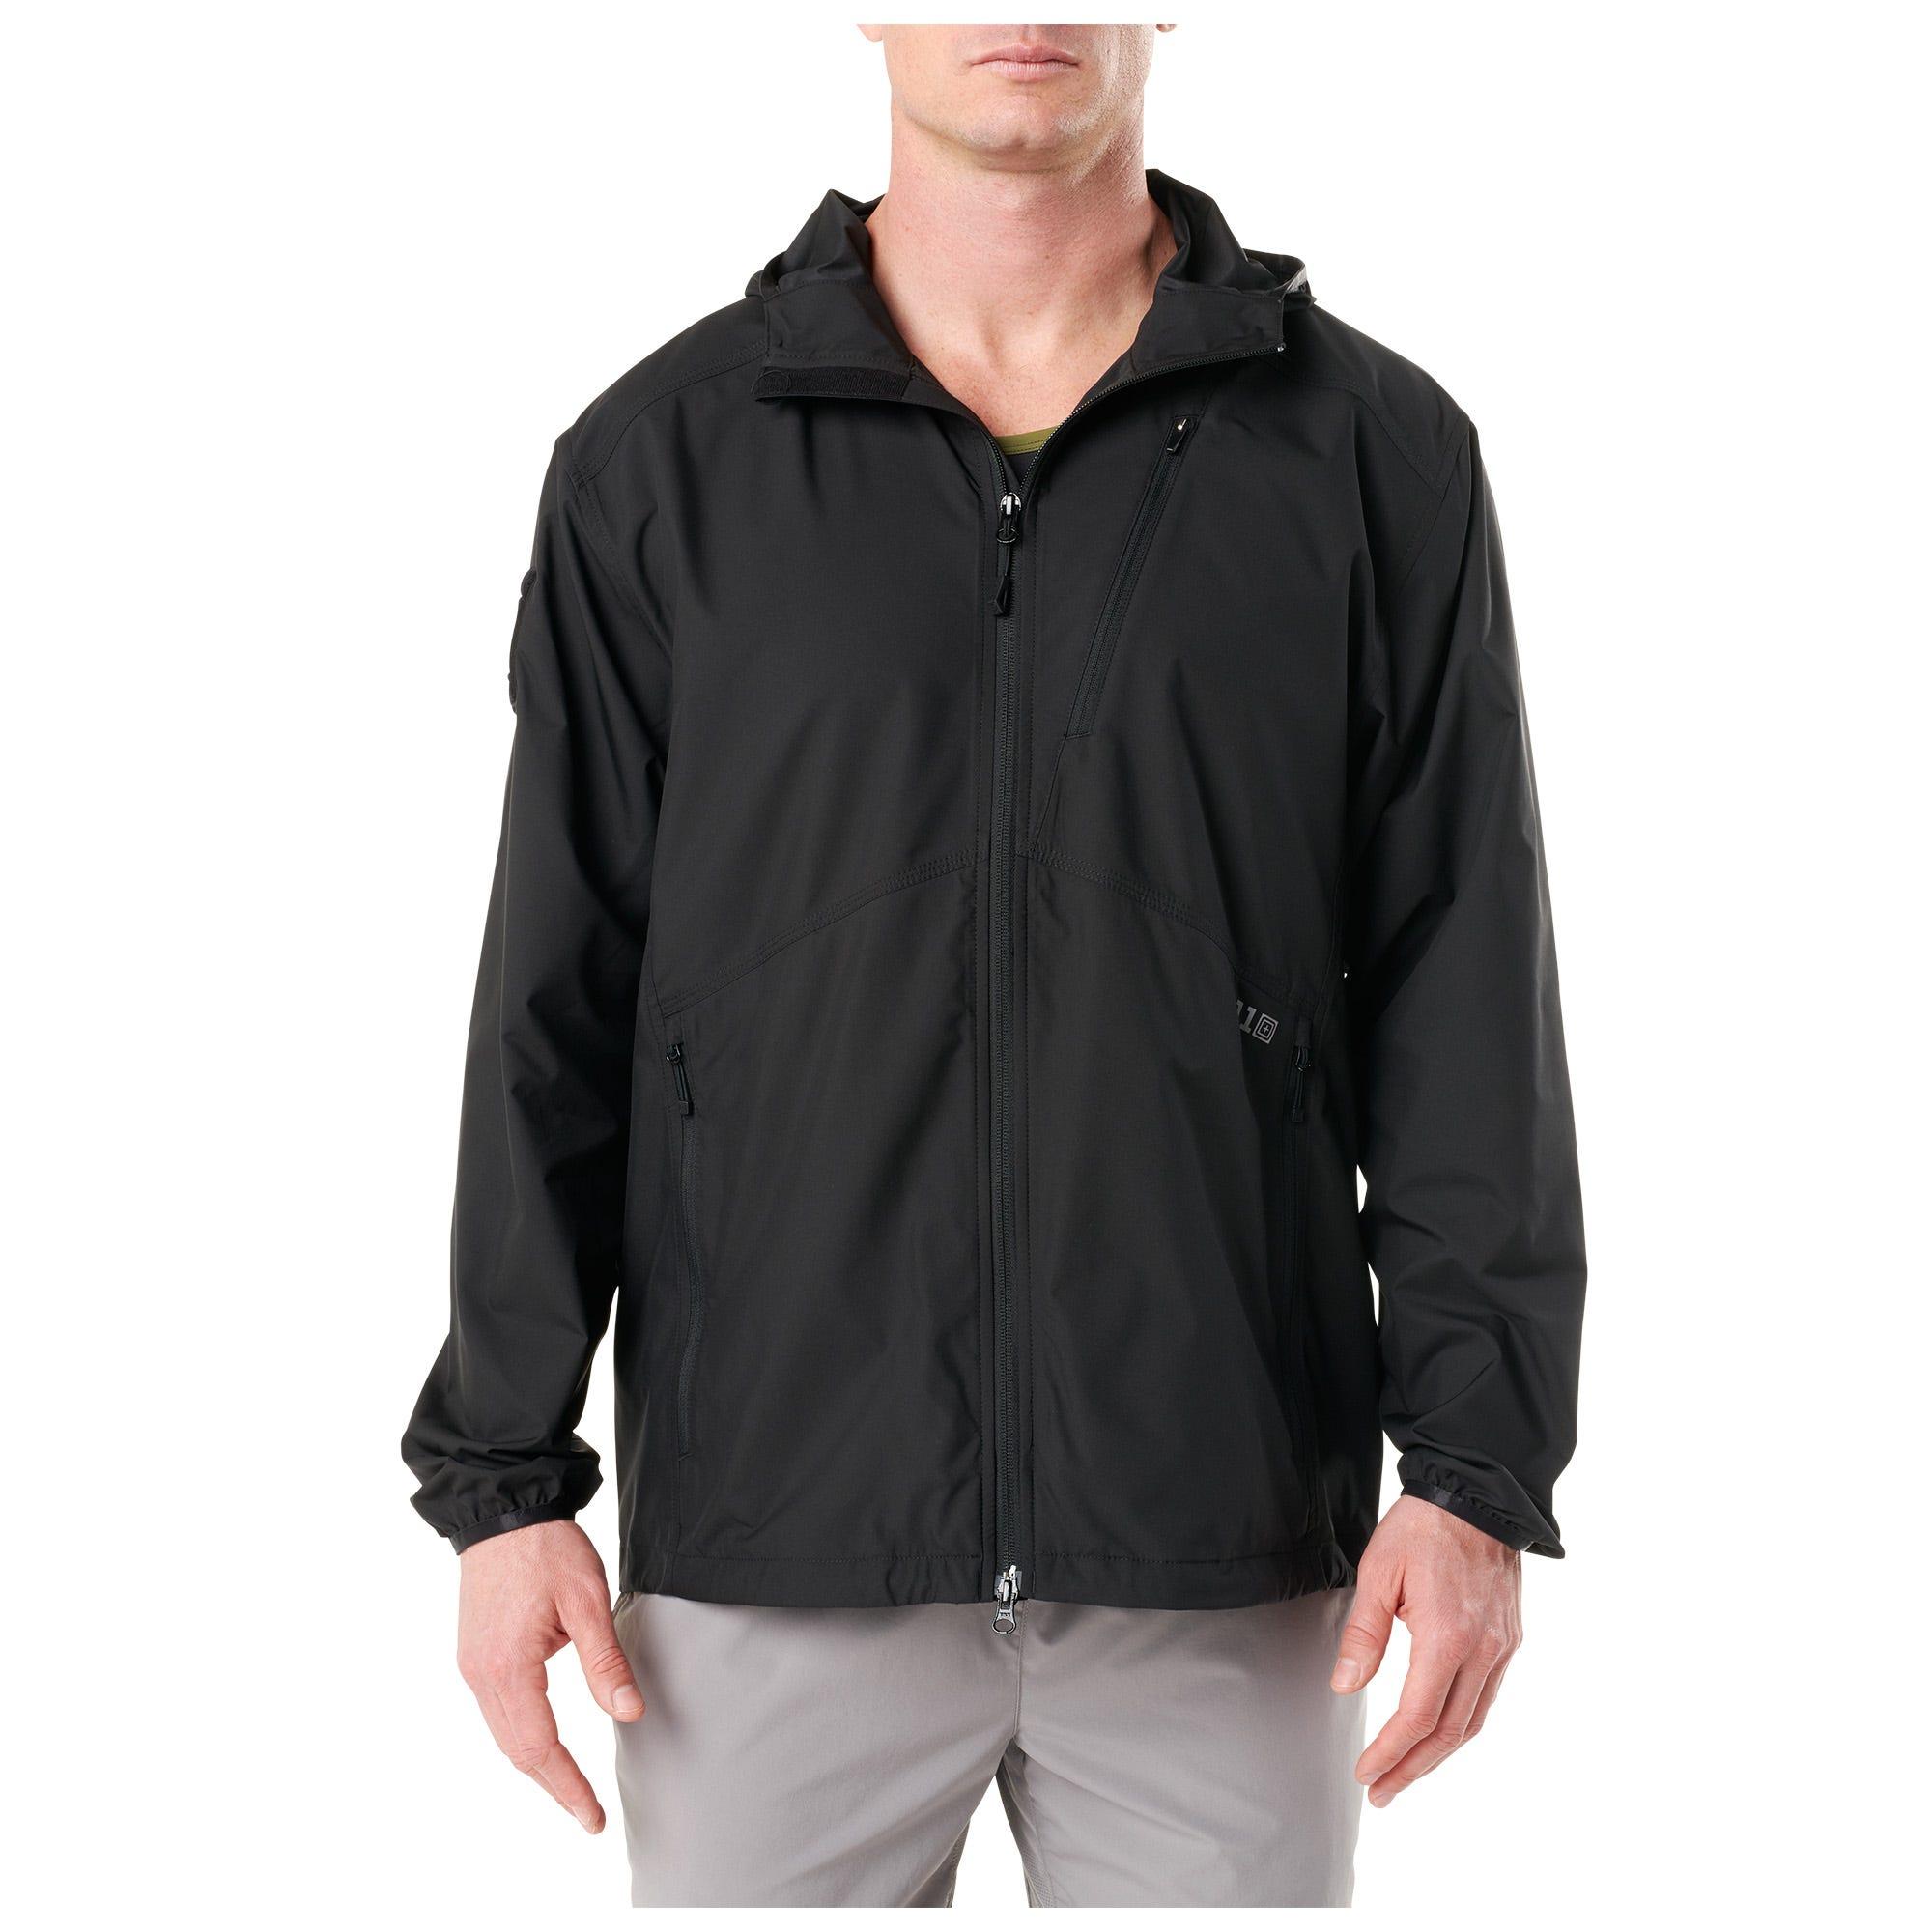 5.11 Tactical Men Cascadia Windbreaker Packable Jacket (Green)